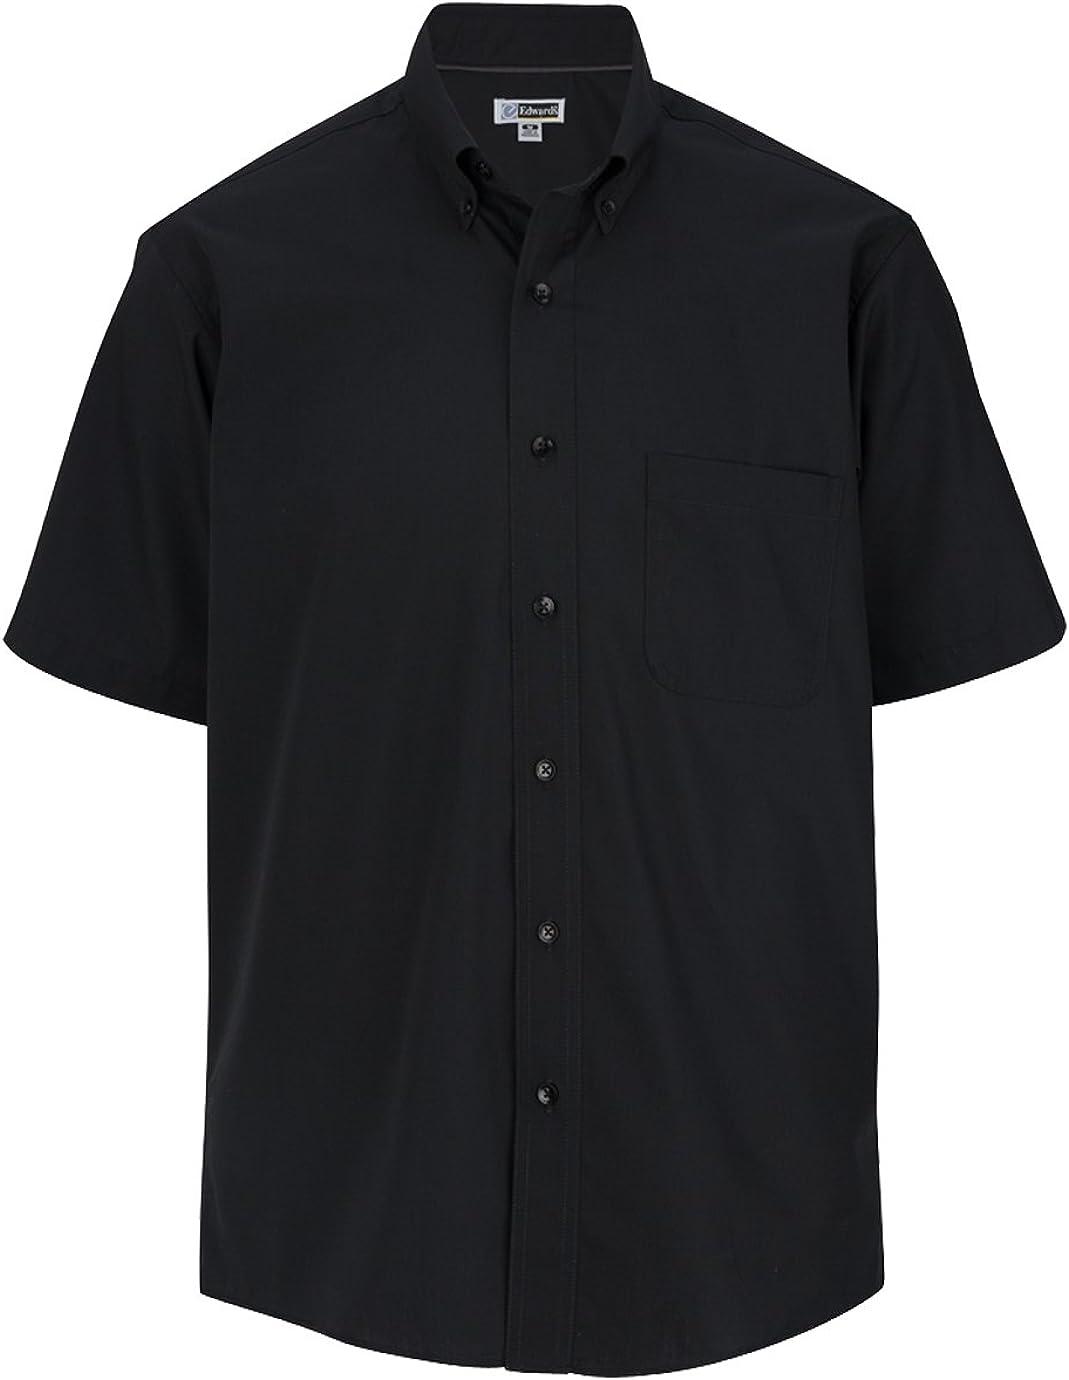 Edwards Garment Men's Big And Tall Wrinkle Resistant Poplin Shirt_BLACK_3XLT